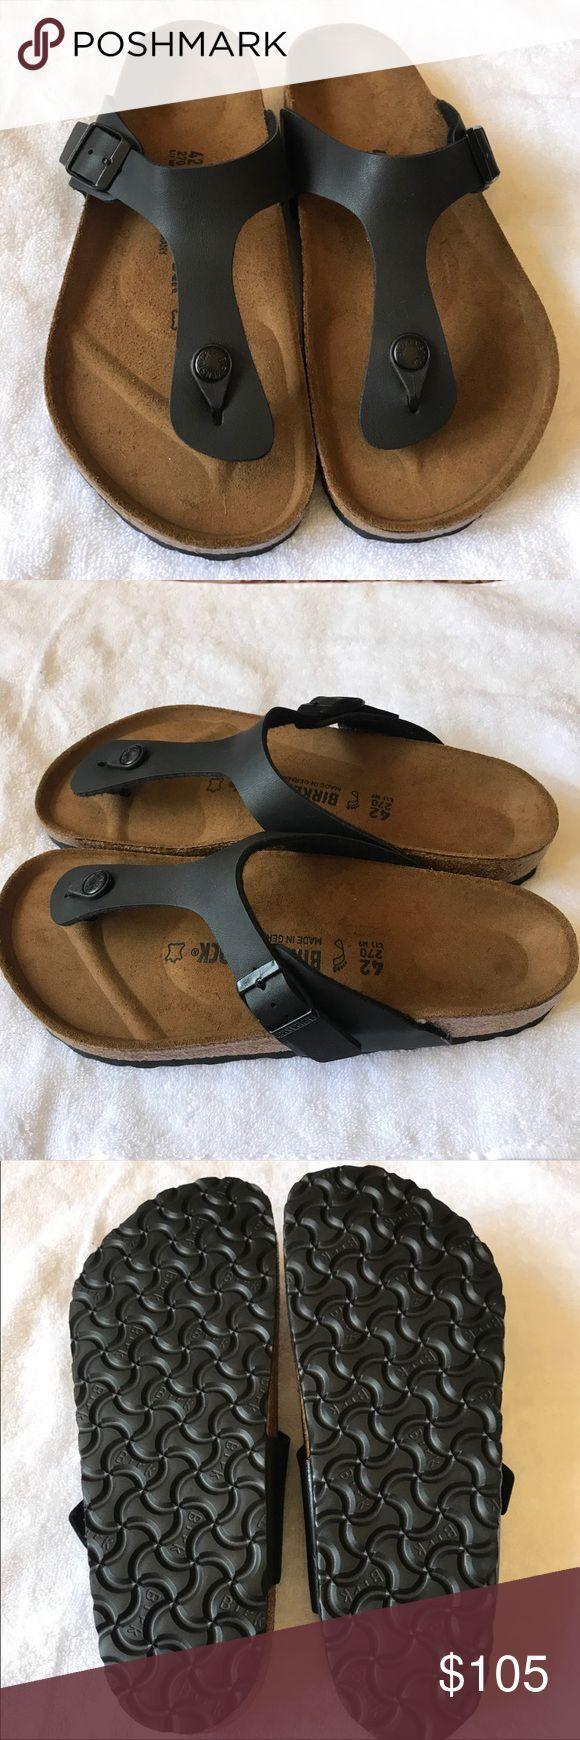 Birkenstock Sandals .... Birkenstock thong Sandals Gizeh Flip Flop Sandals Faux Black Leather Beige Cork Sole Comfort Fit German Shoes Adjustable Buckle strap New with Box size 42 [11 - 11.5 ] Birkenstock Shoes Sandals